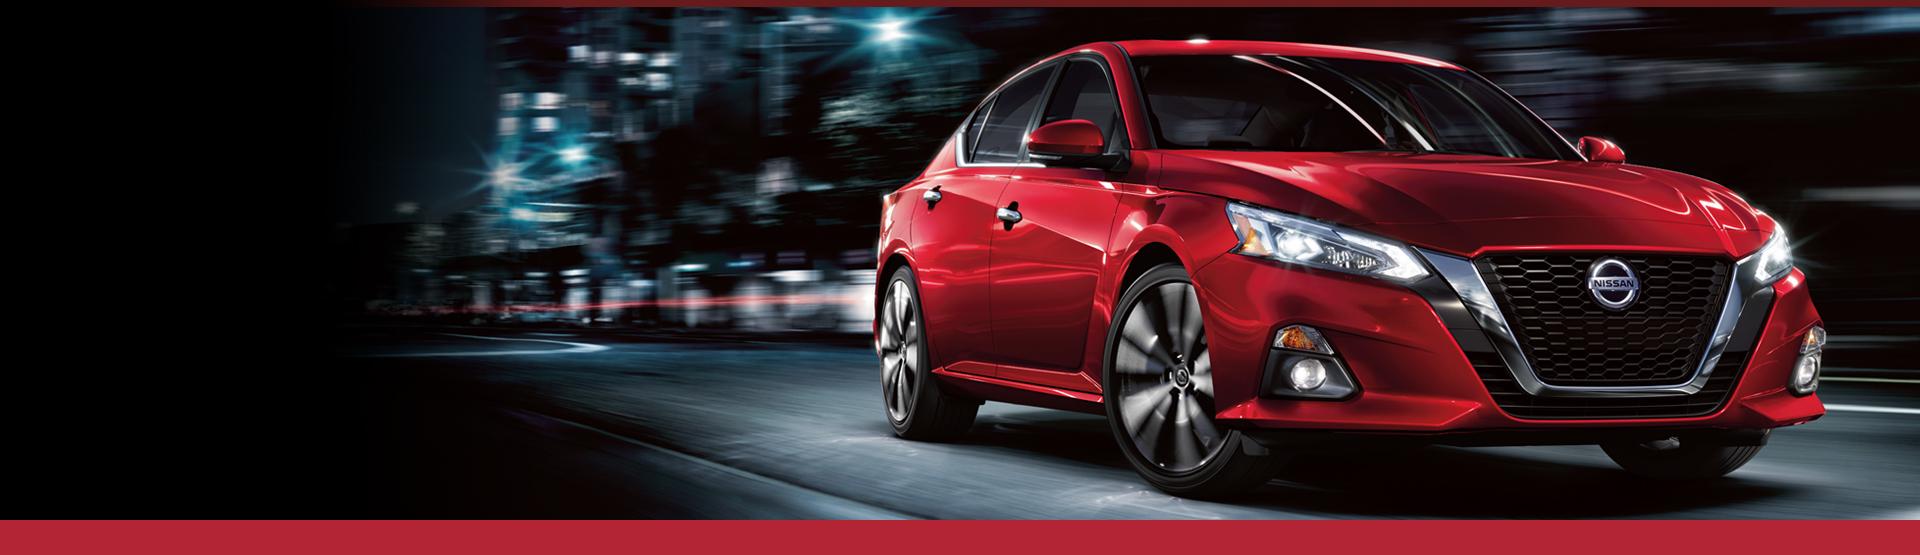 All New 2019 Nissan Altima